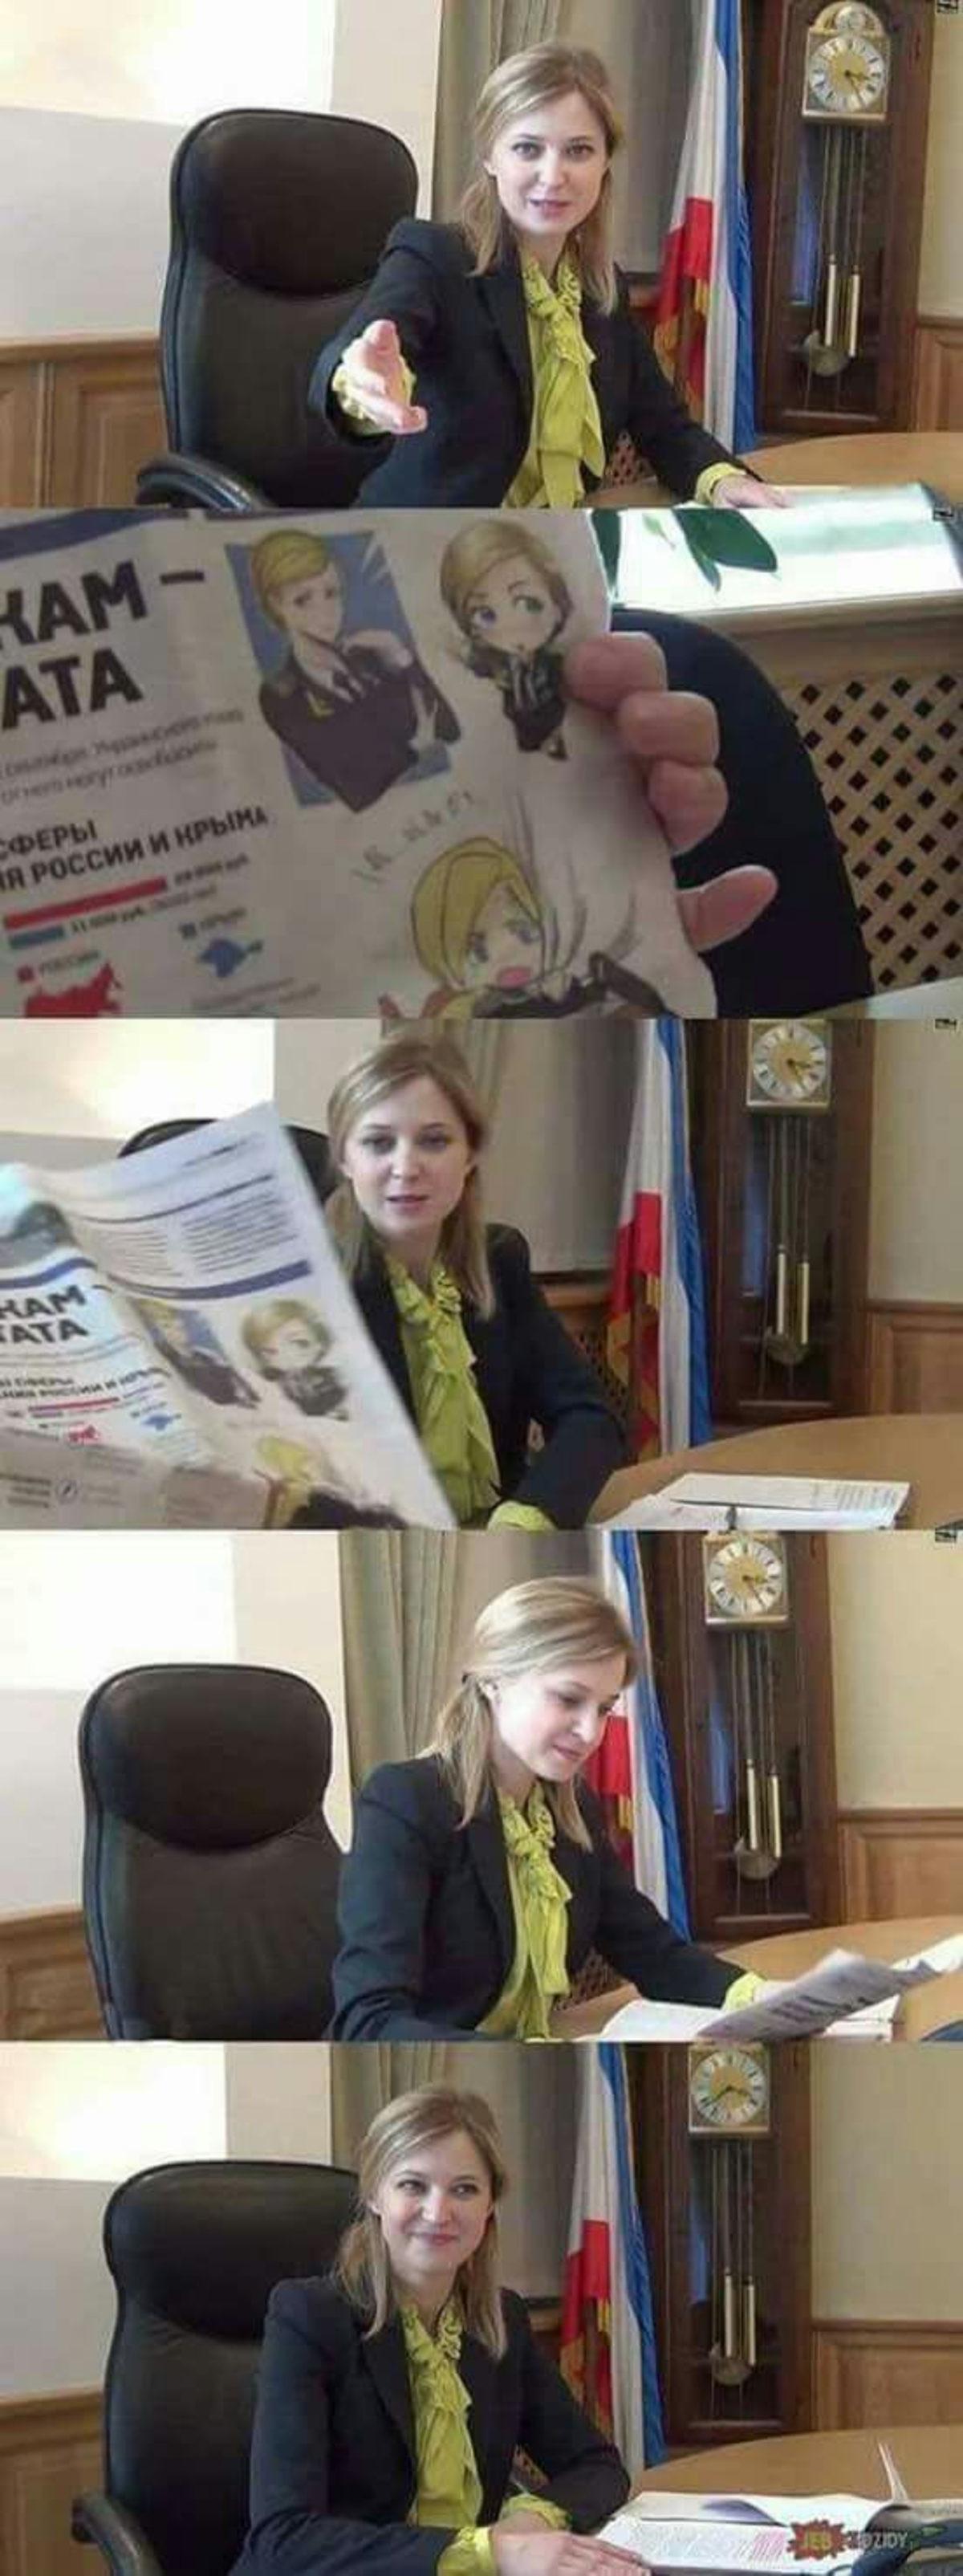 Natalia Poklonskaya. .. I had hope that she will say: A goo! kawaii desu! But she was like: I'm real person, not a cartoon.